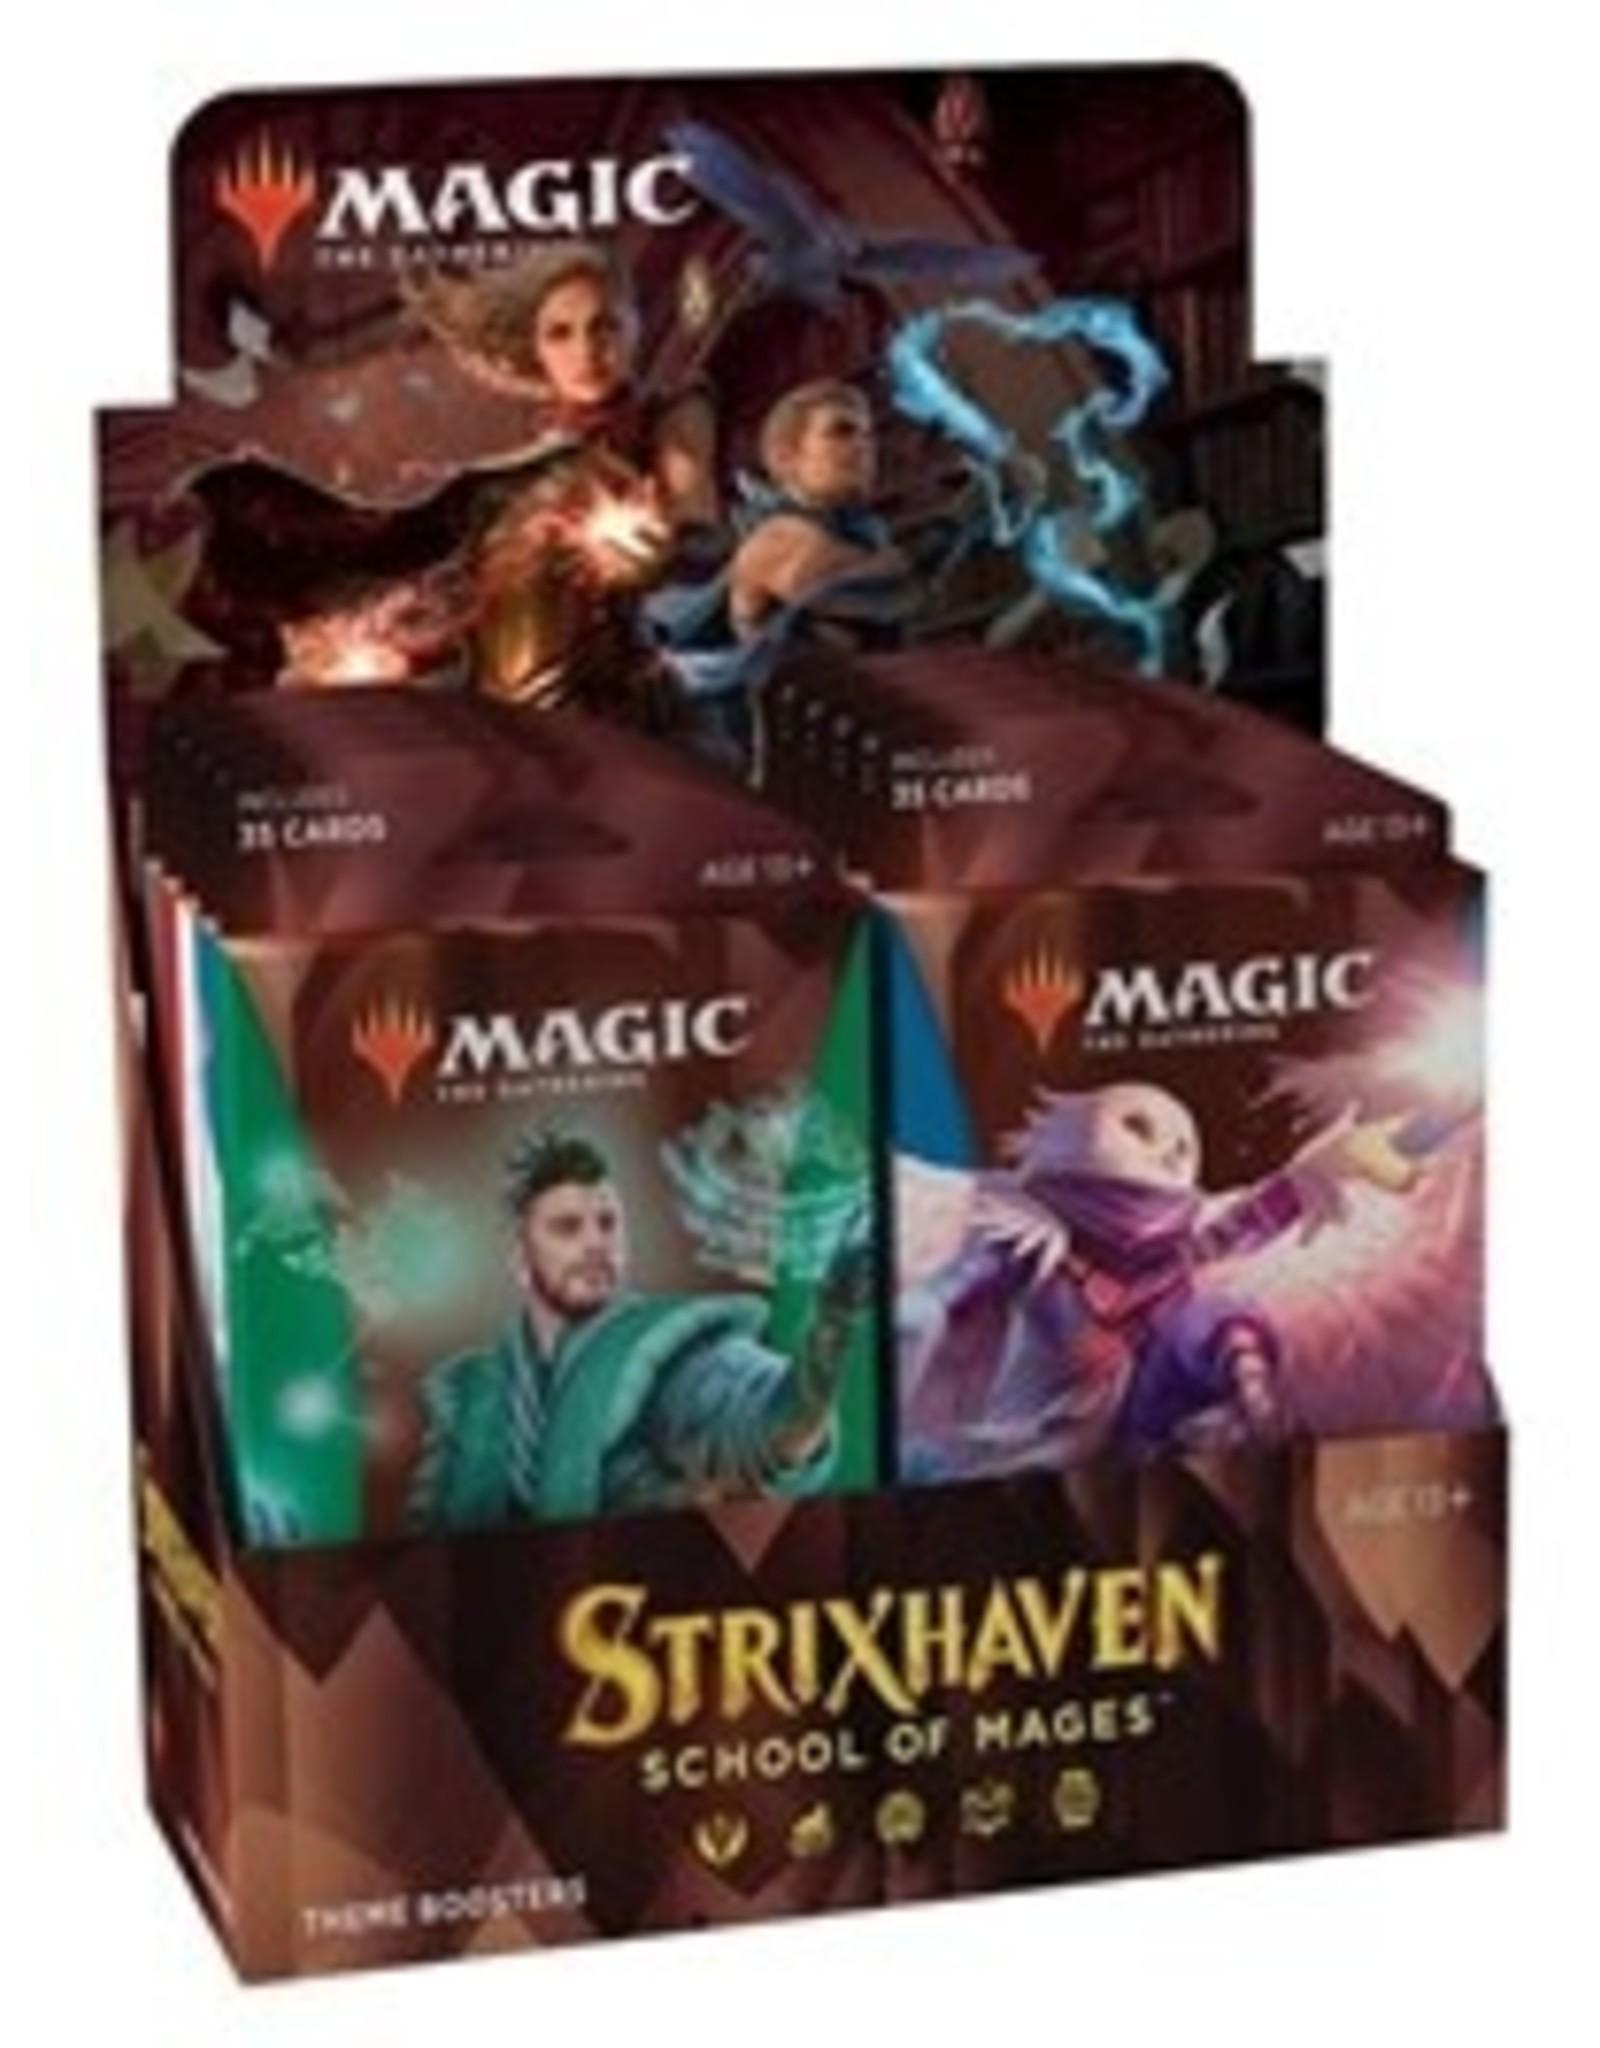 Magic Magic The Gathering: Strixhaven Theme Booster